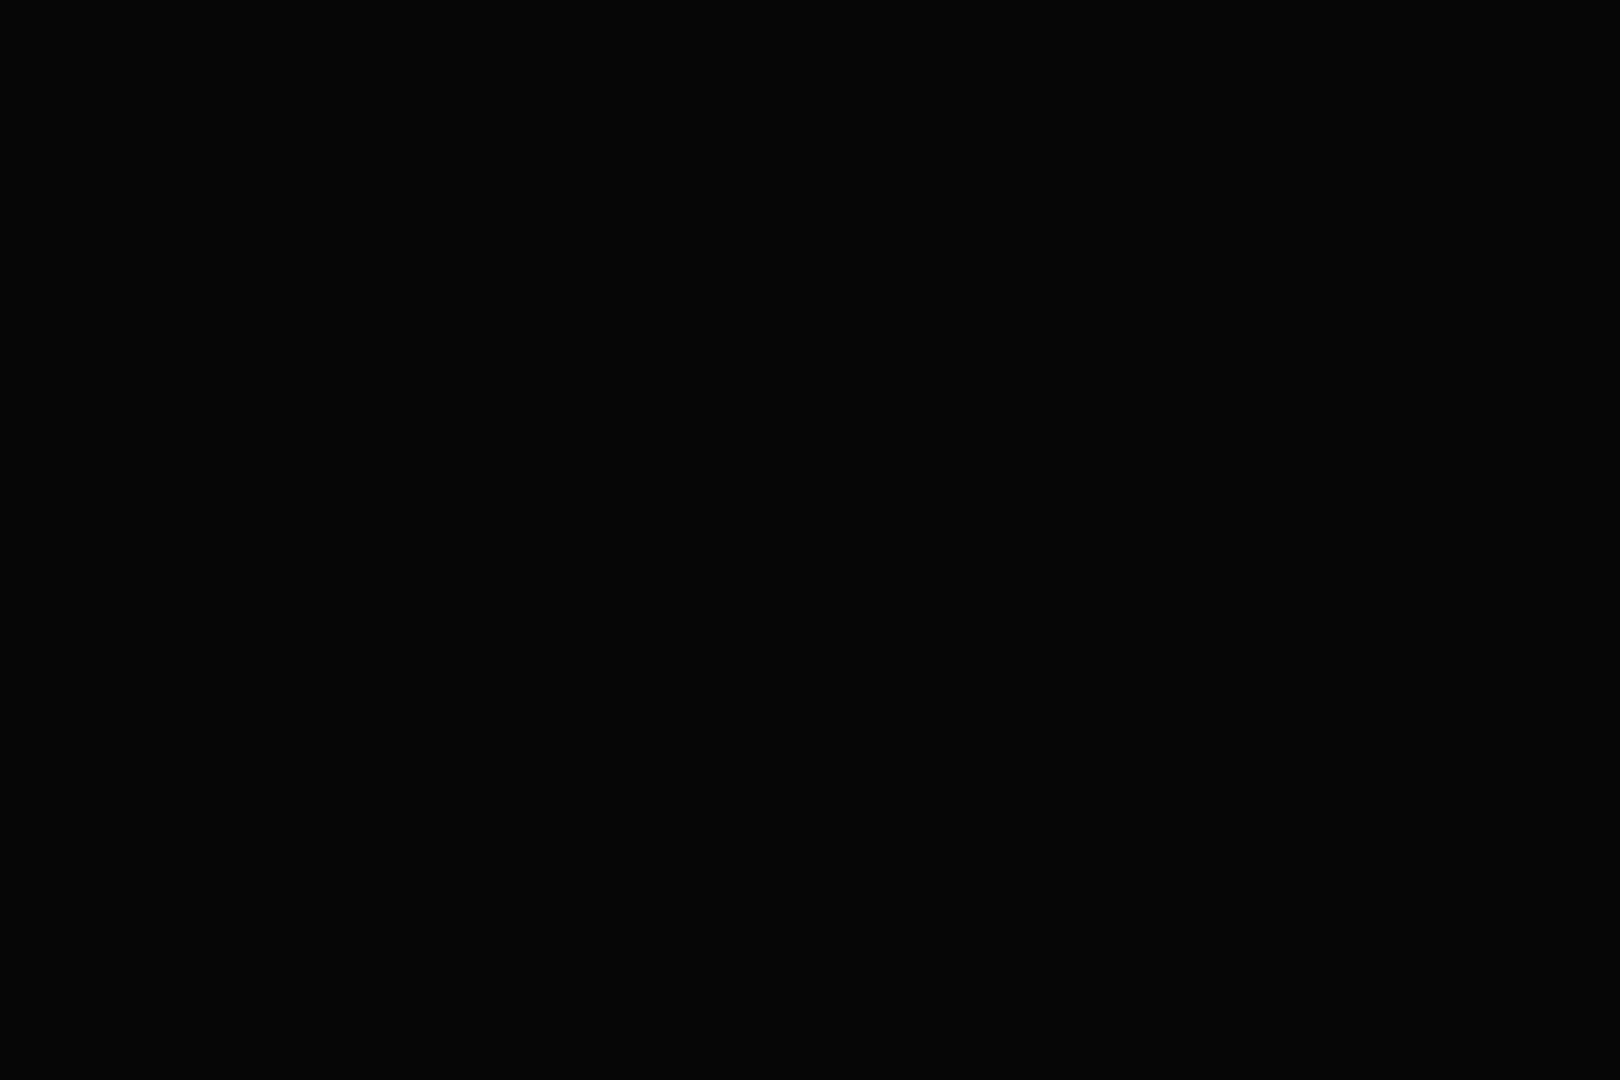 充血監督の深夜の運動会Vol.157 車 | 美女OL  68連発 31